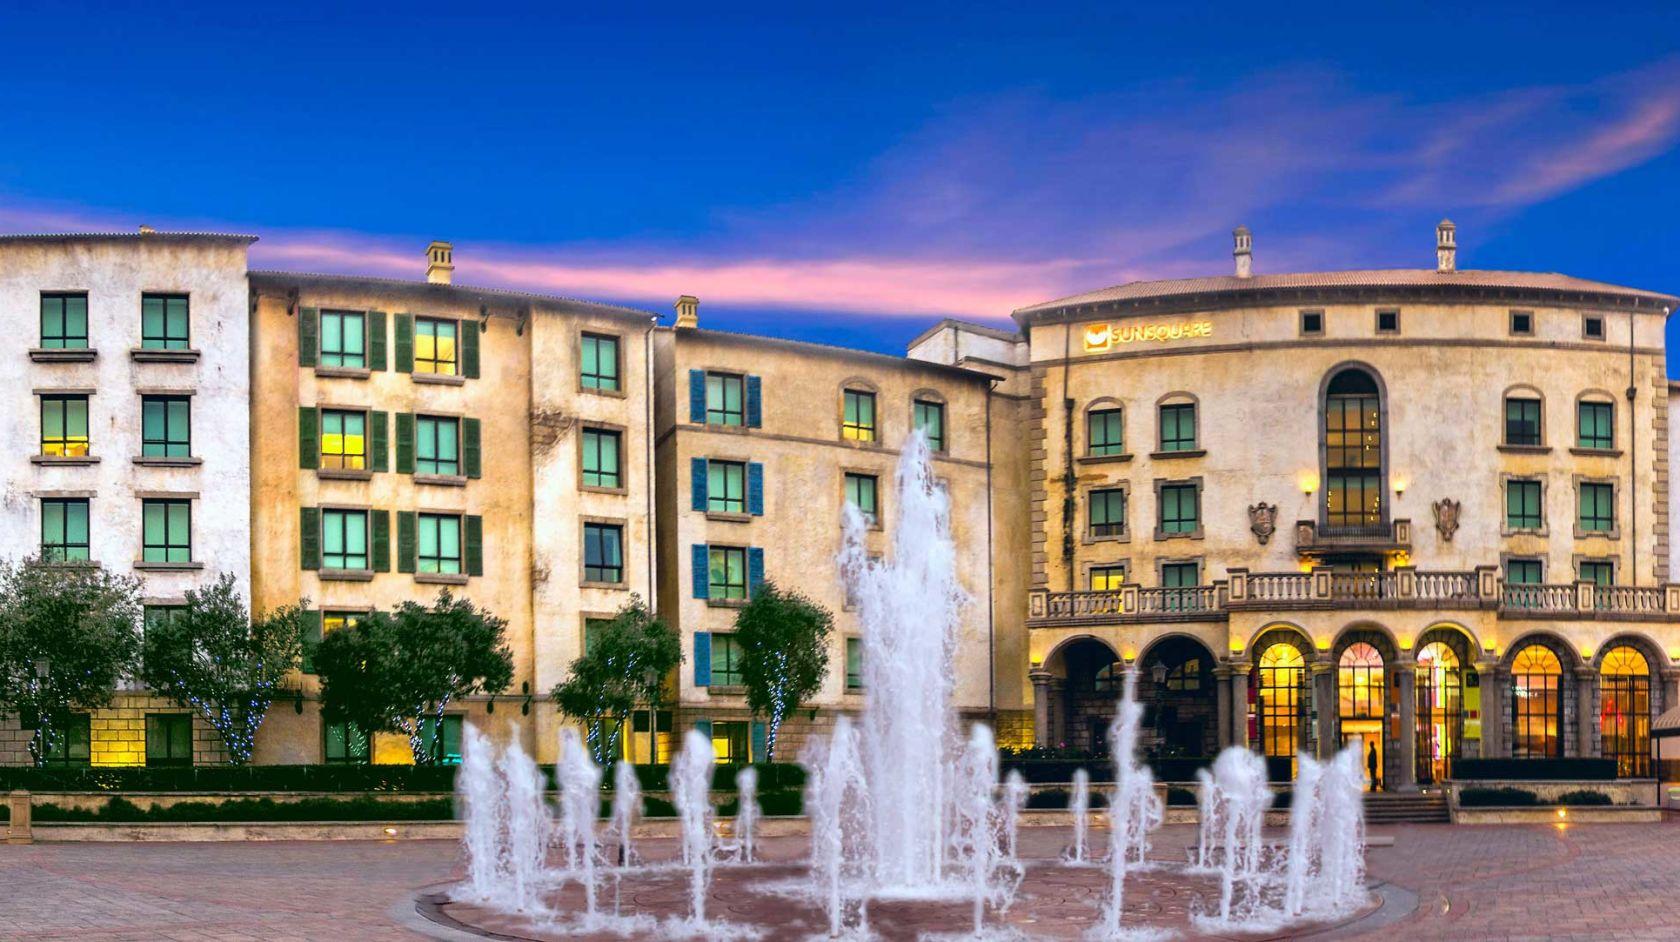 Make it a #DateNight to remember with SunSquare Montecasino